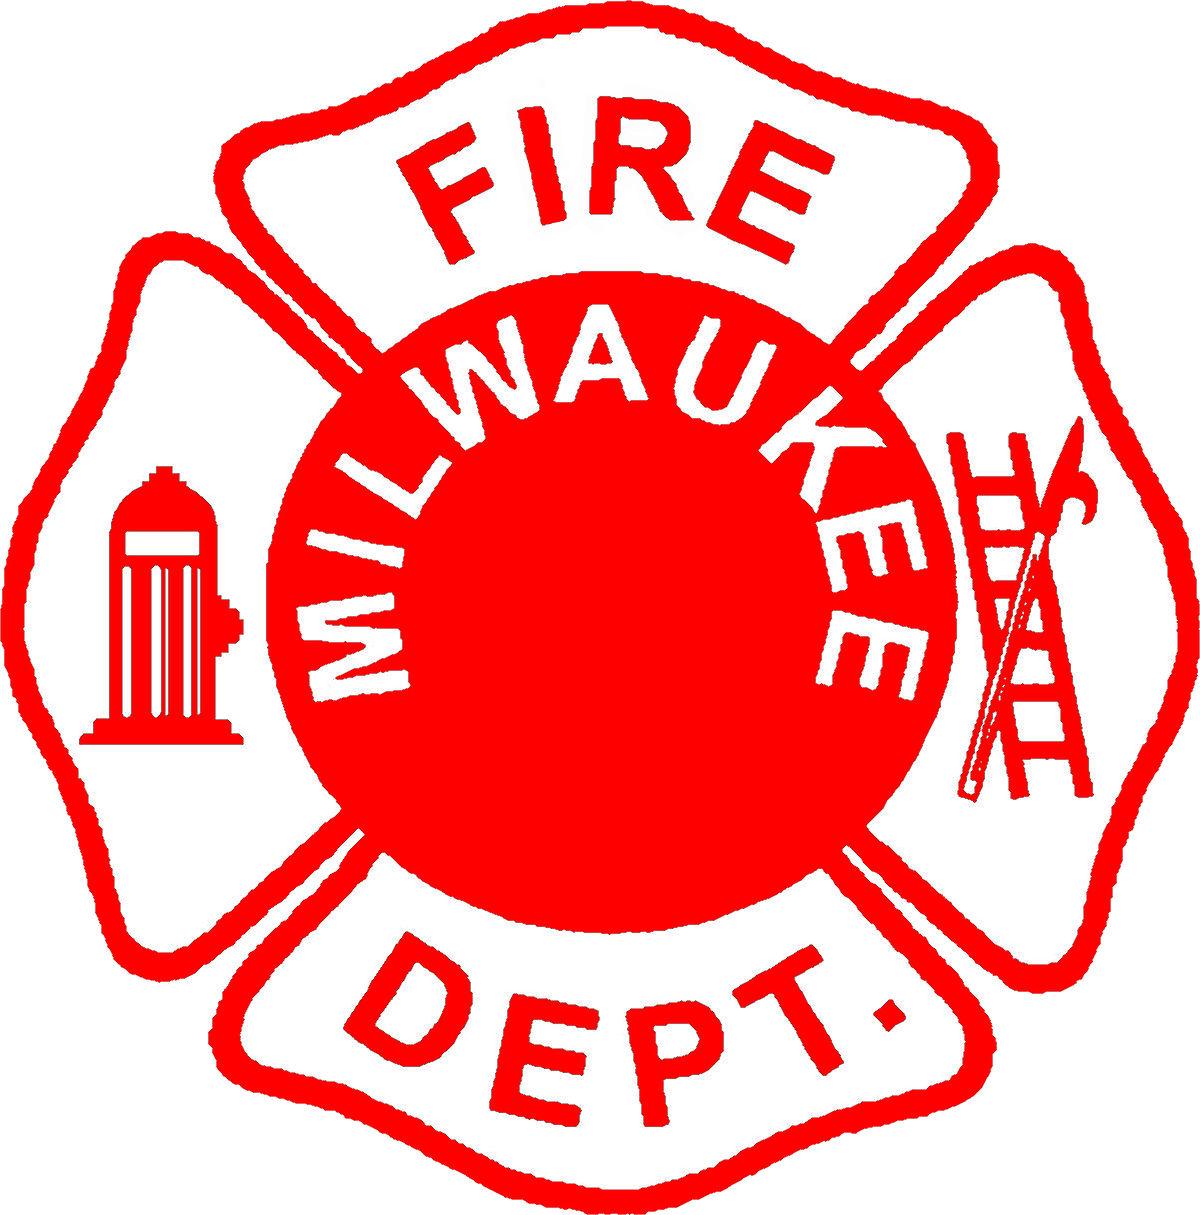 milwaukee fire department wikipedia U of I Basketball Men's Basketball University of Illinois